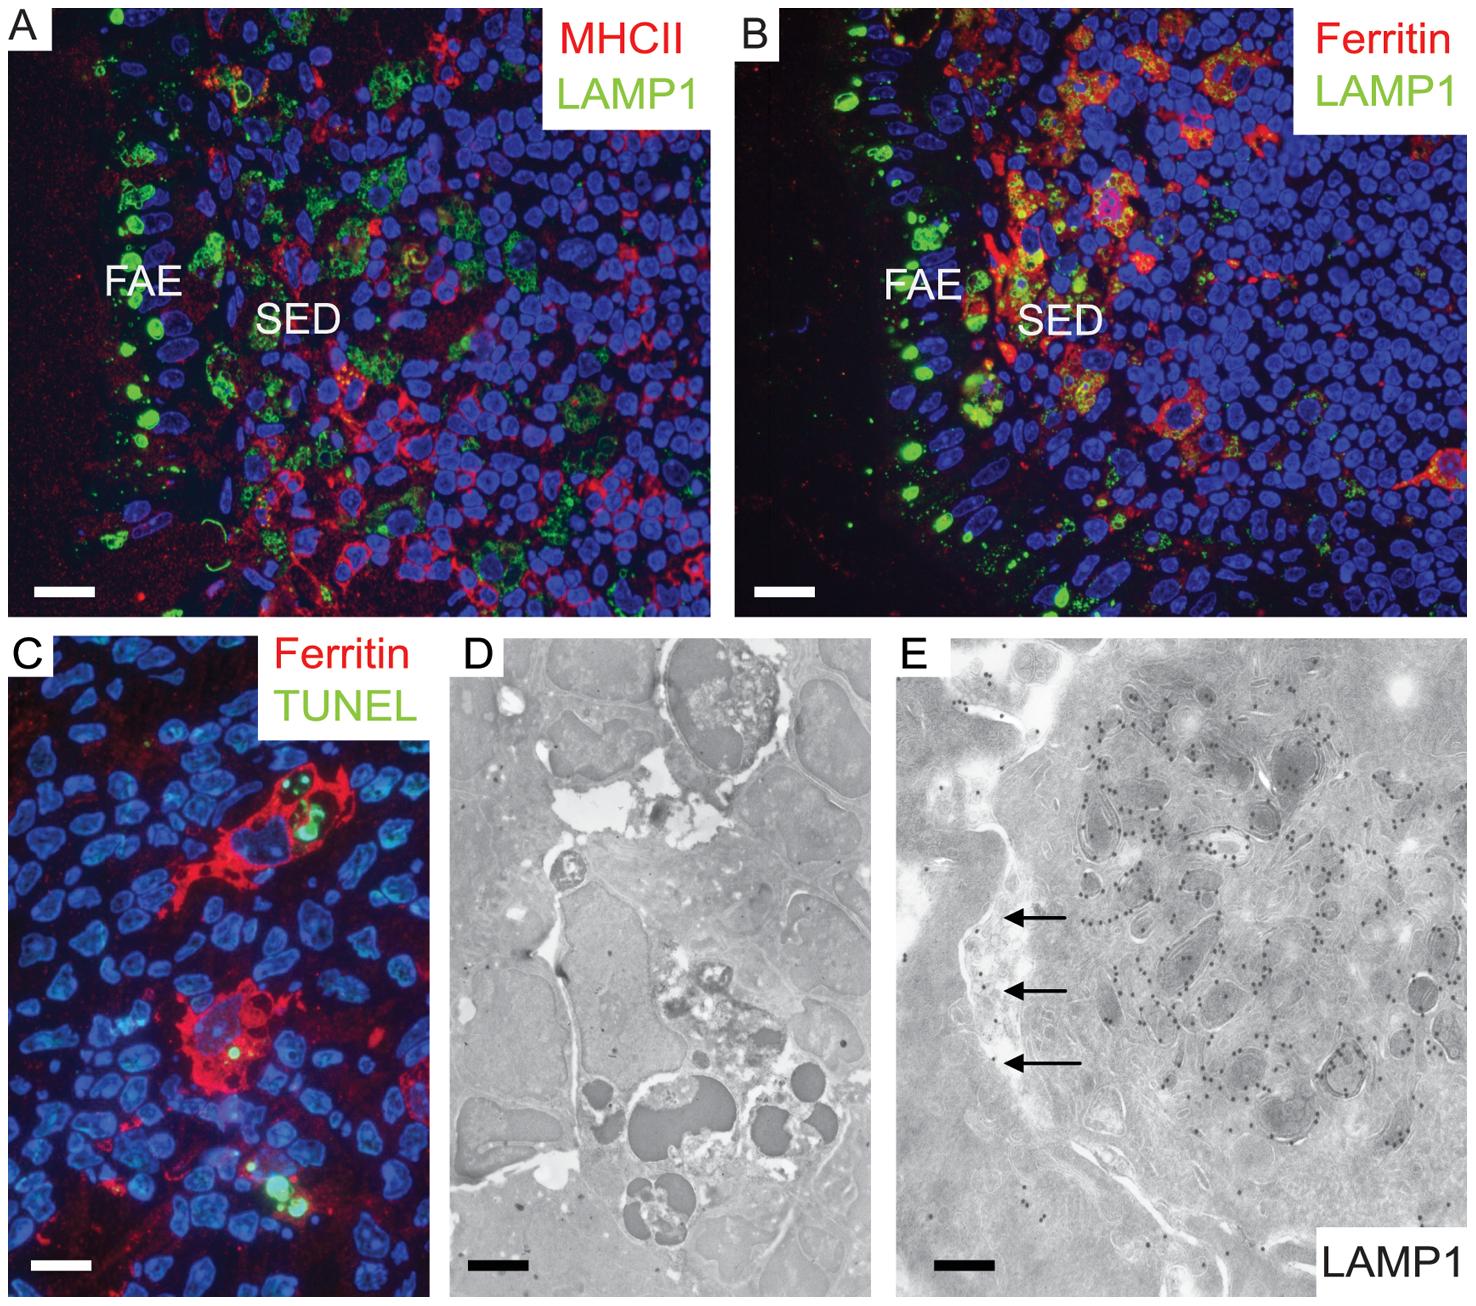 Two separate subpopulations of phagocytic monocytes in SED.